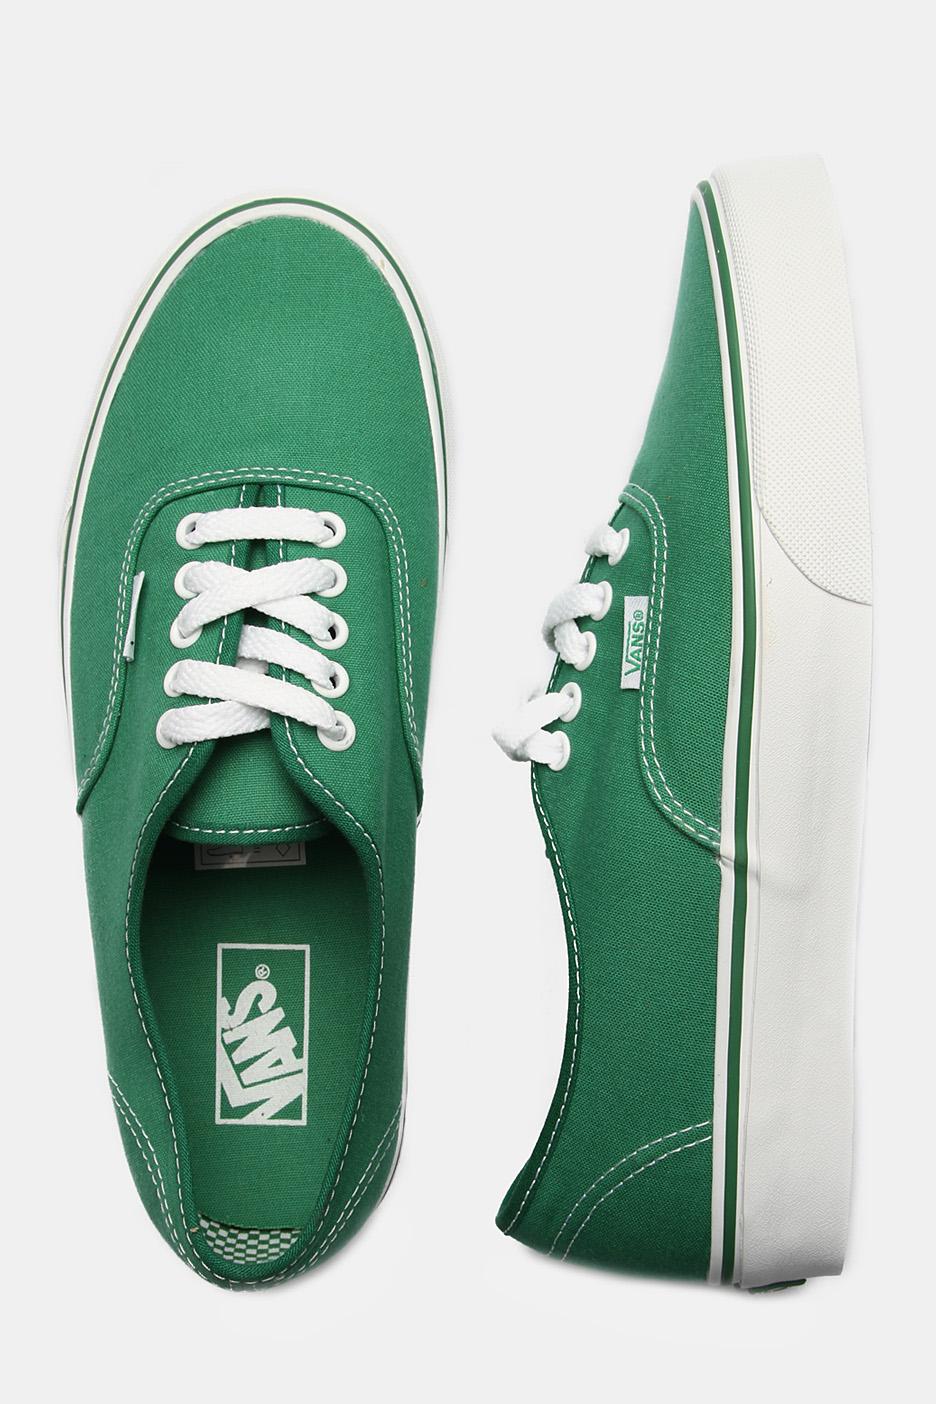 green vans shoes